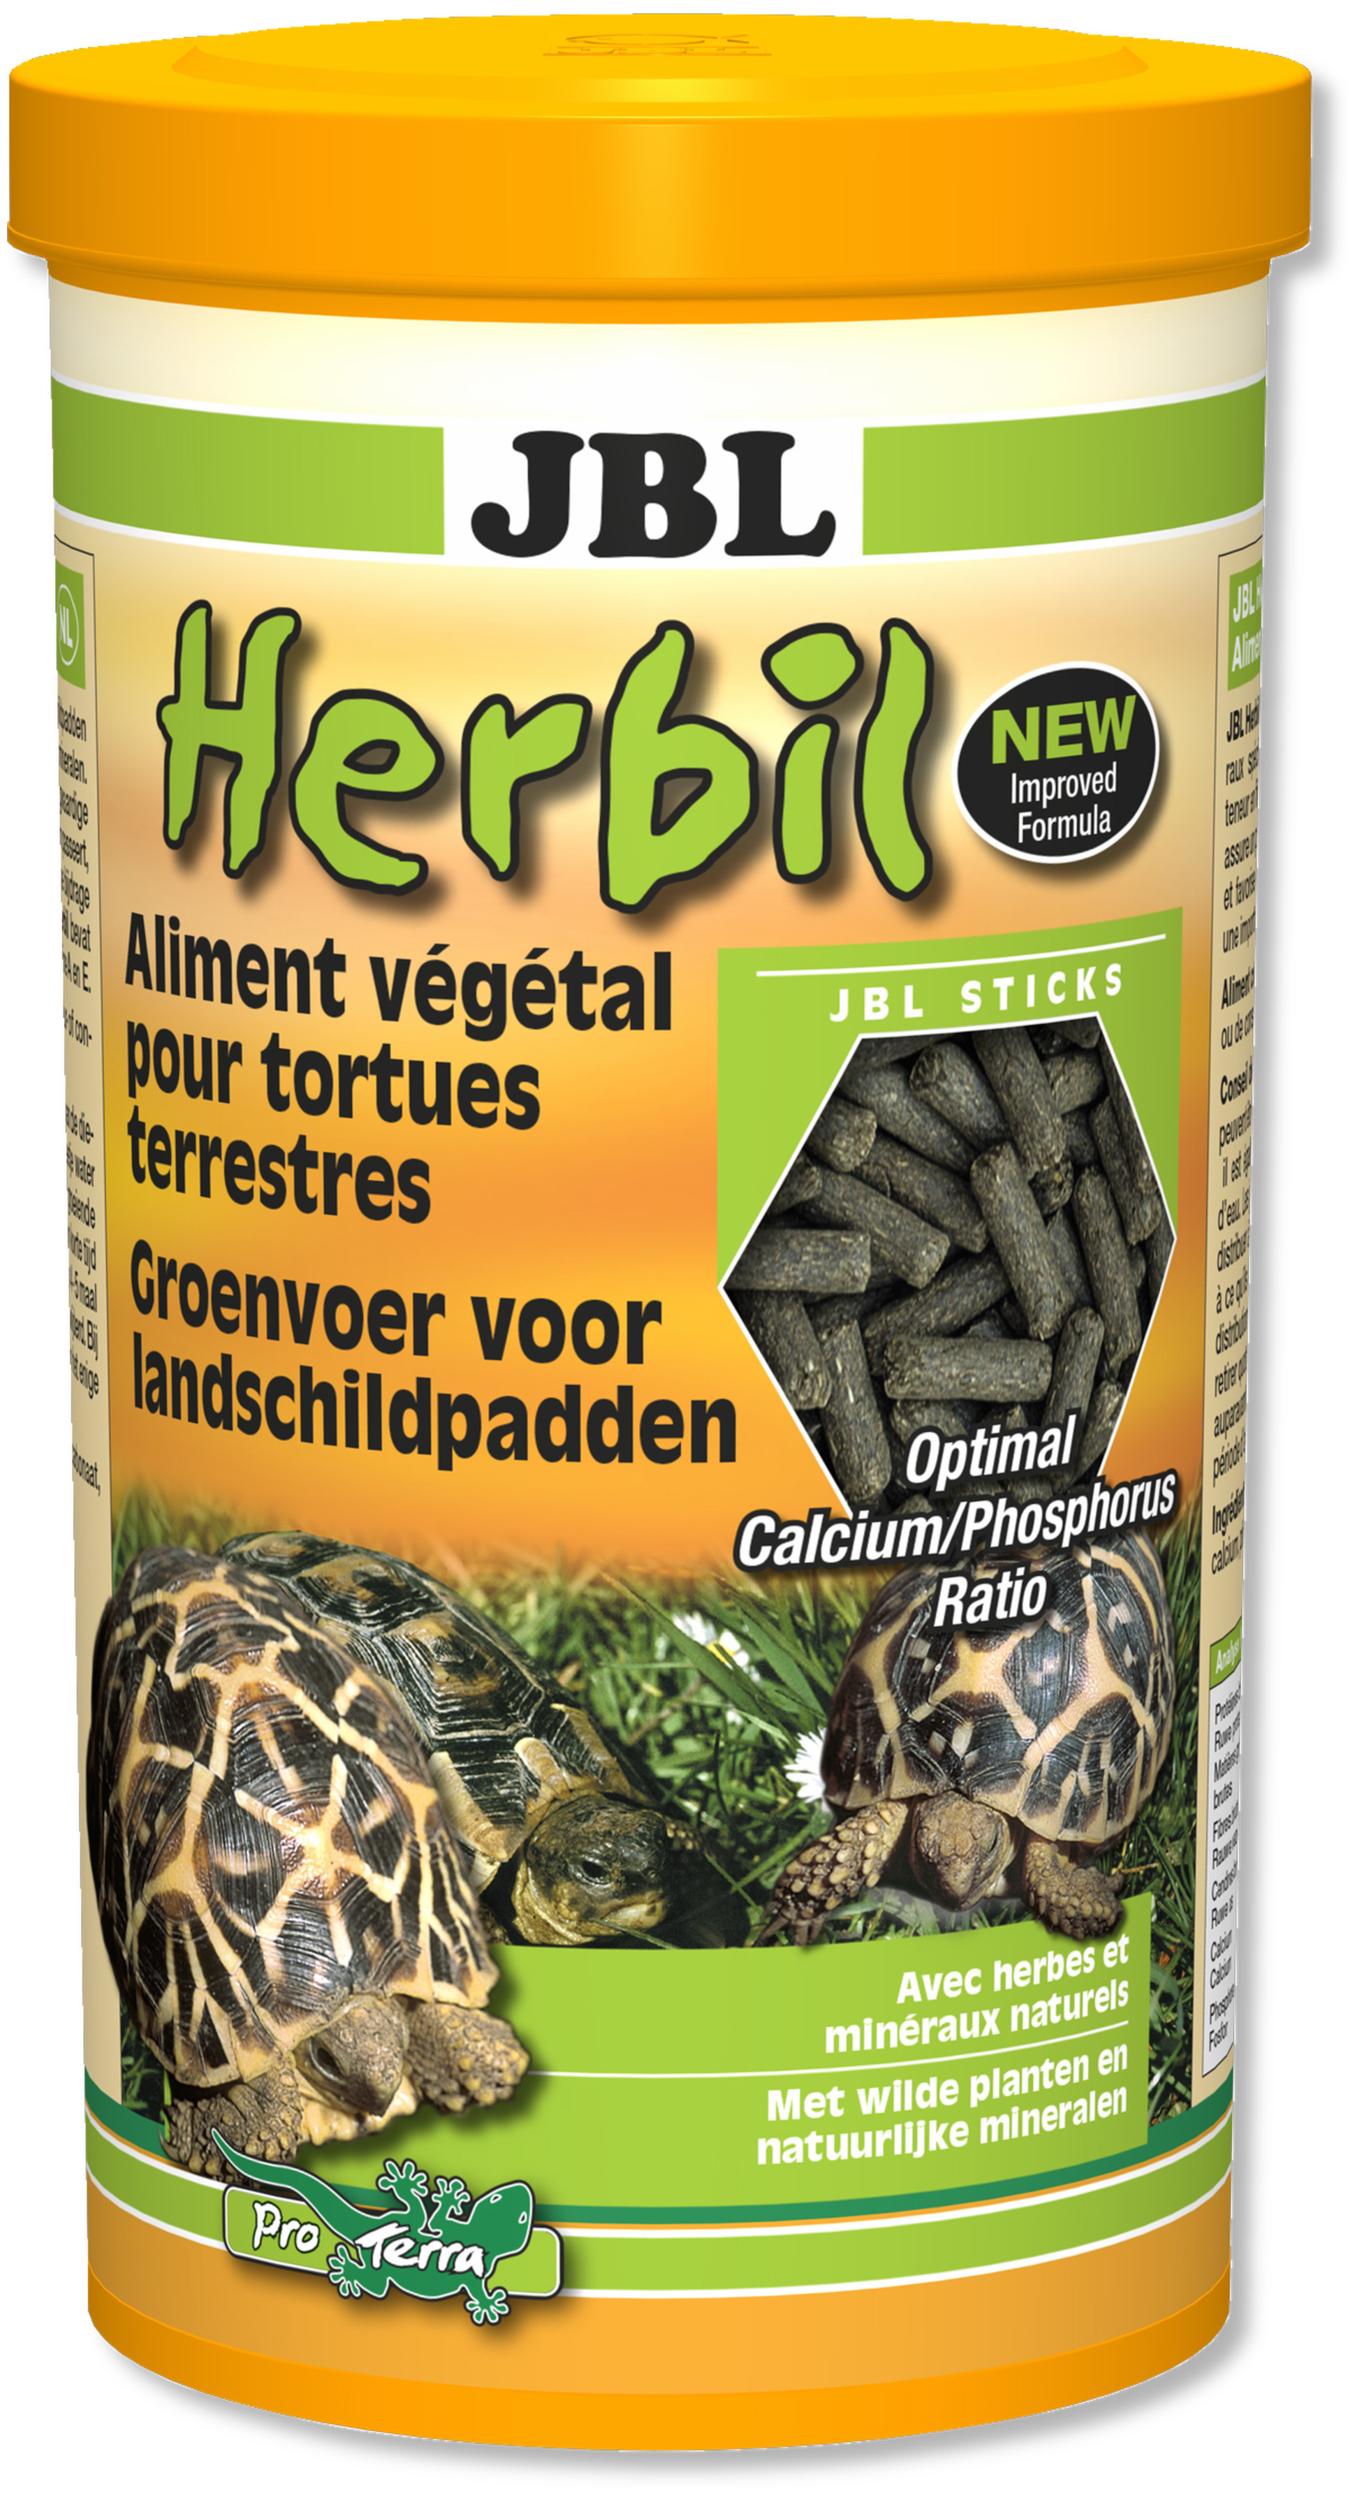 jbl-herbil-1-l-nourriture-pour-torture-de-terre